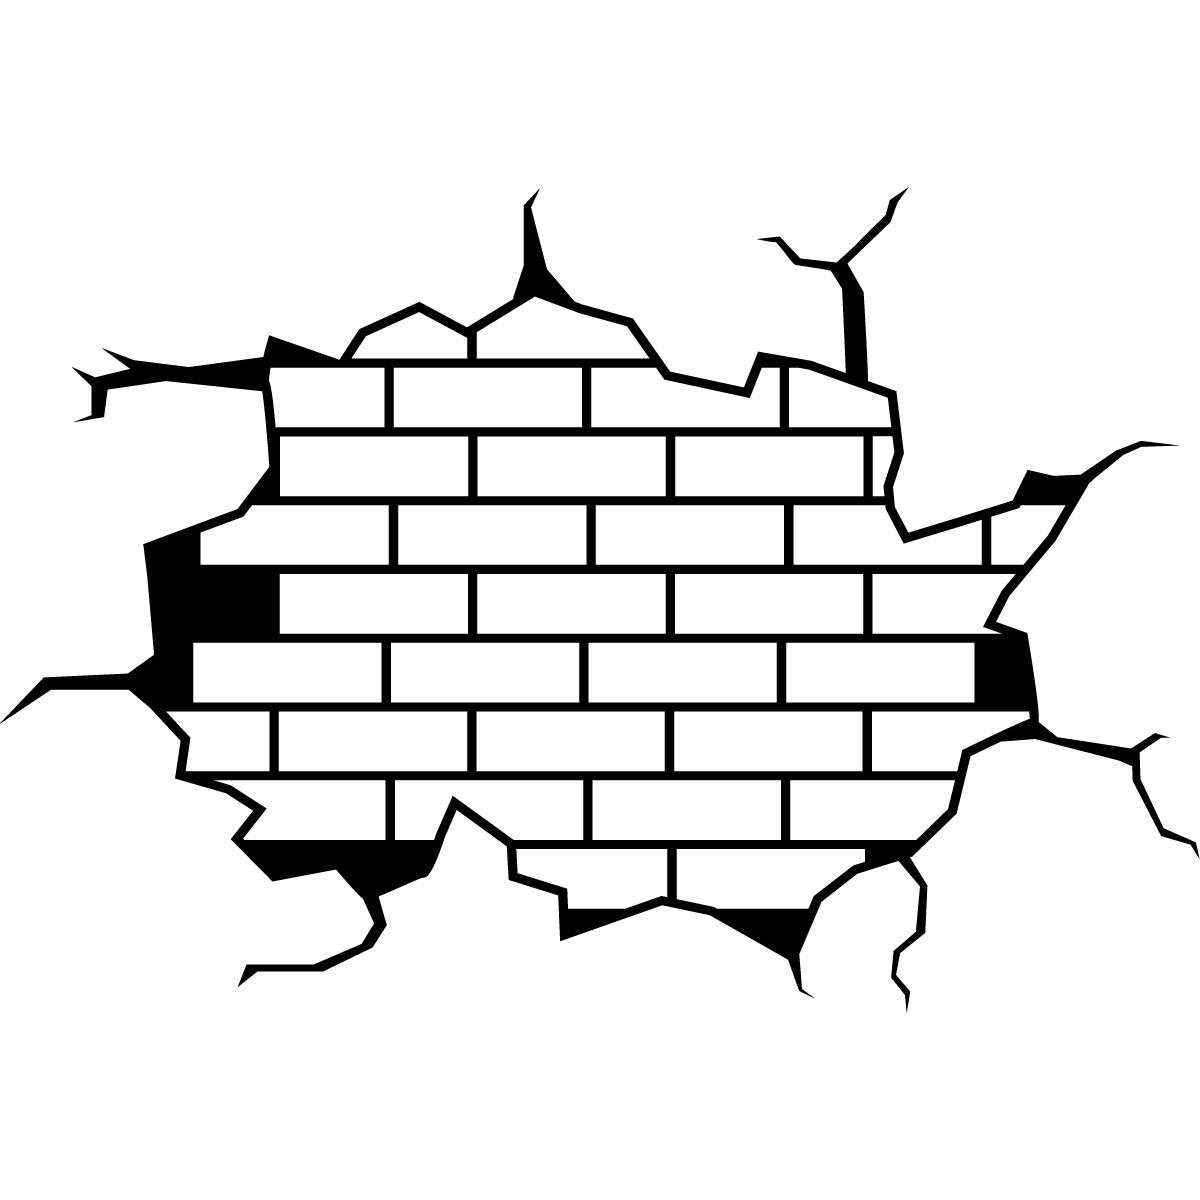 sticker design mur en briques stickers art et design vintage ambiance sticker. Black Bedroom Furniture Sets. Home Design Ideas